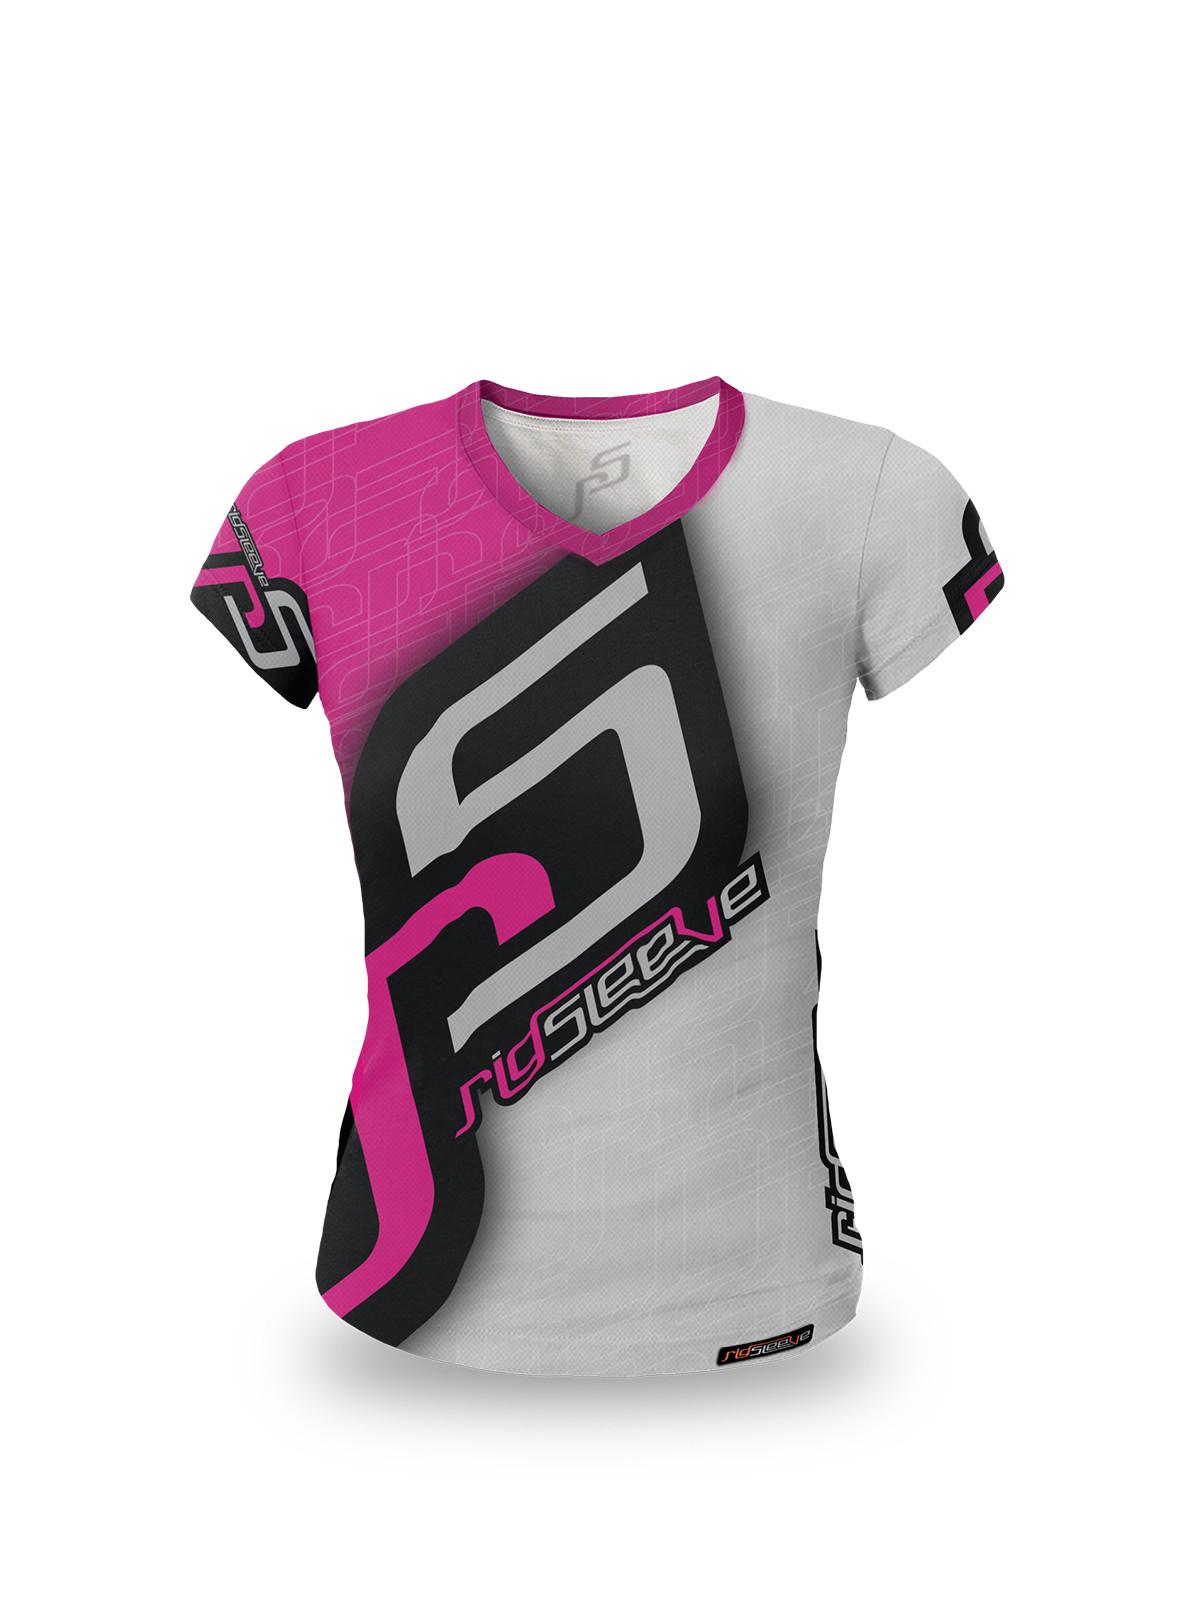 RS Women's Jersey